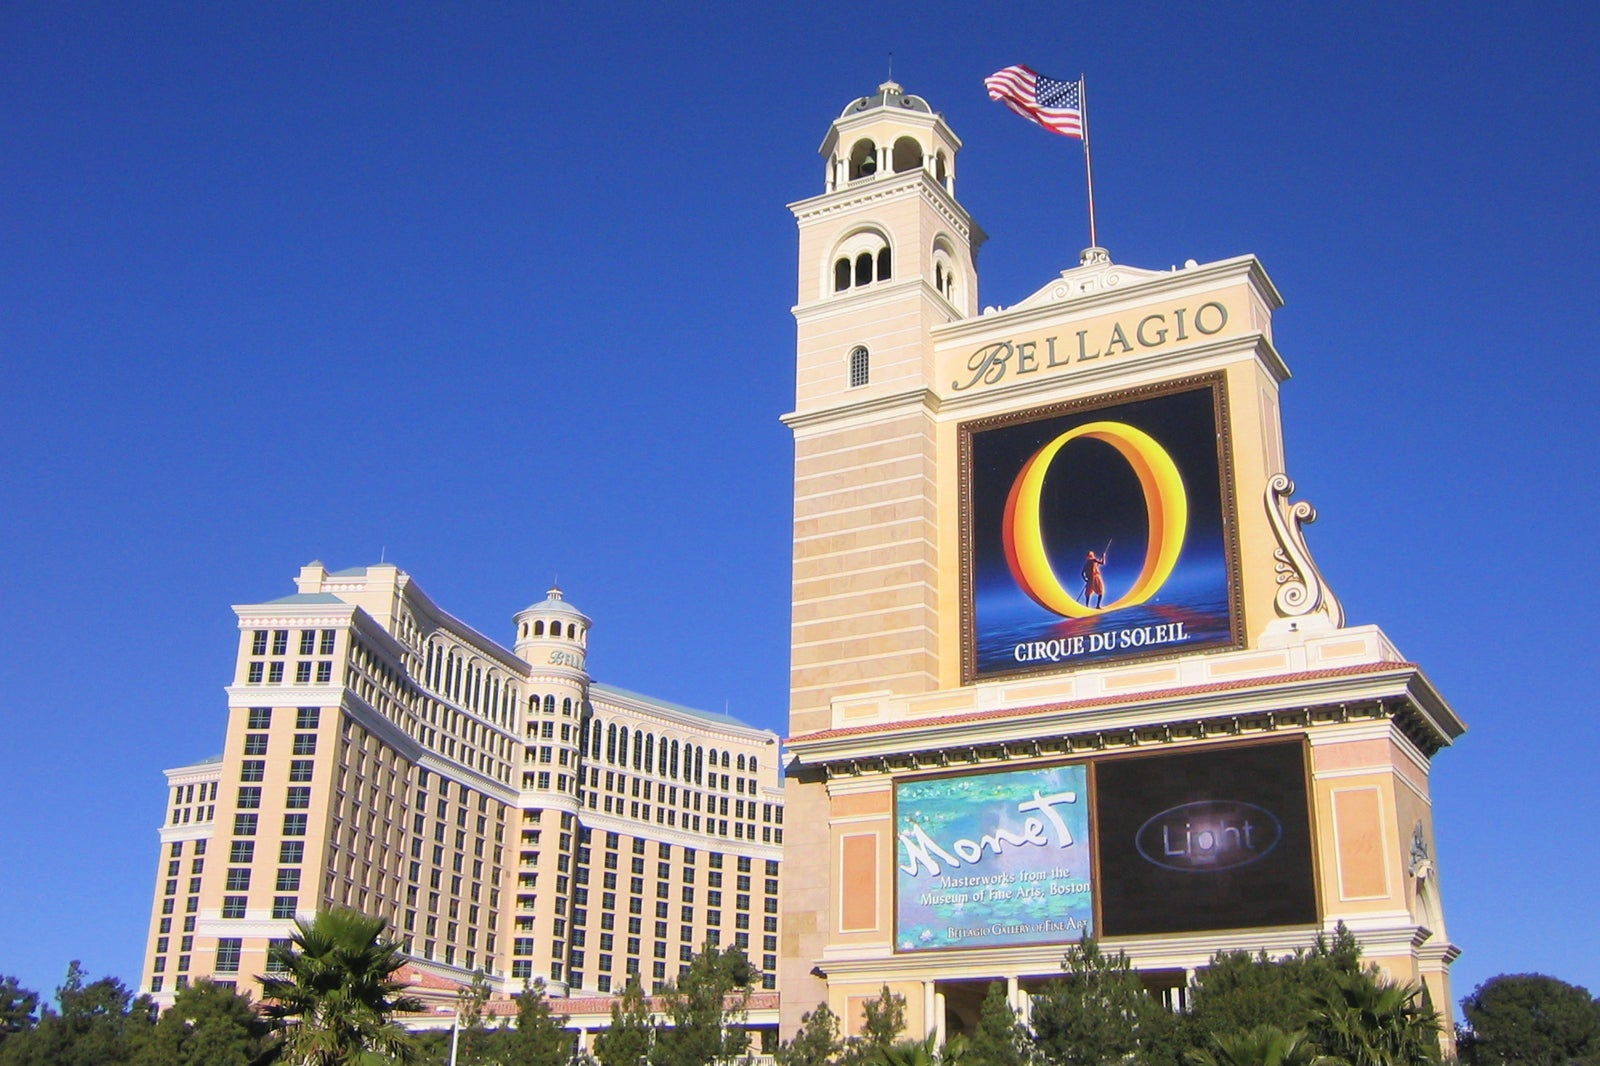 Bellagio Hotel And Casino In Las Vegas An Elegant Italian Inspired Casino Hotel On The Strip Go Guides